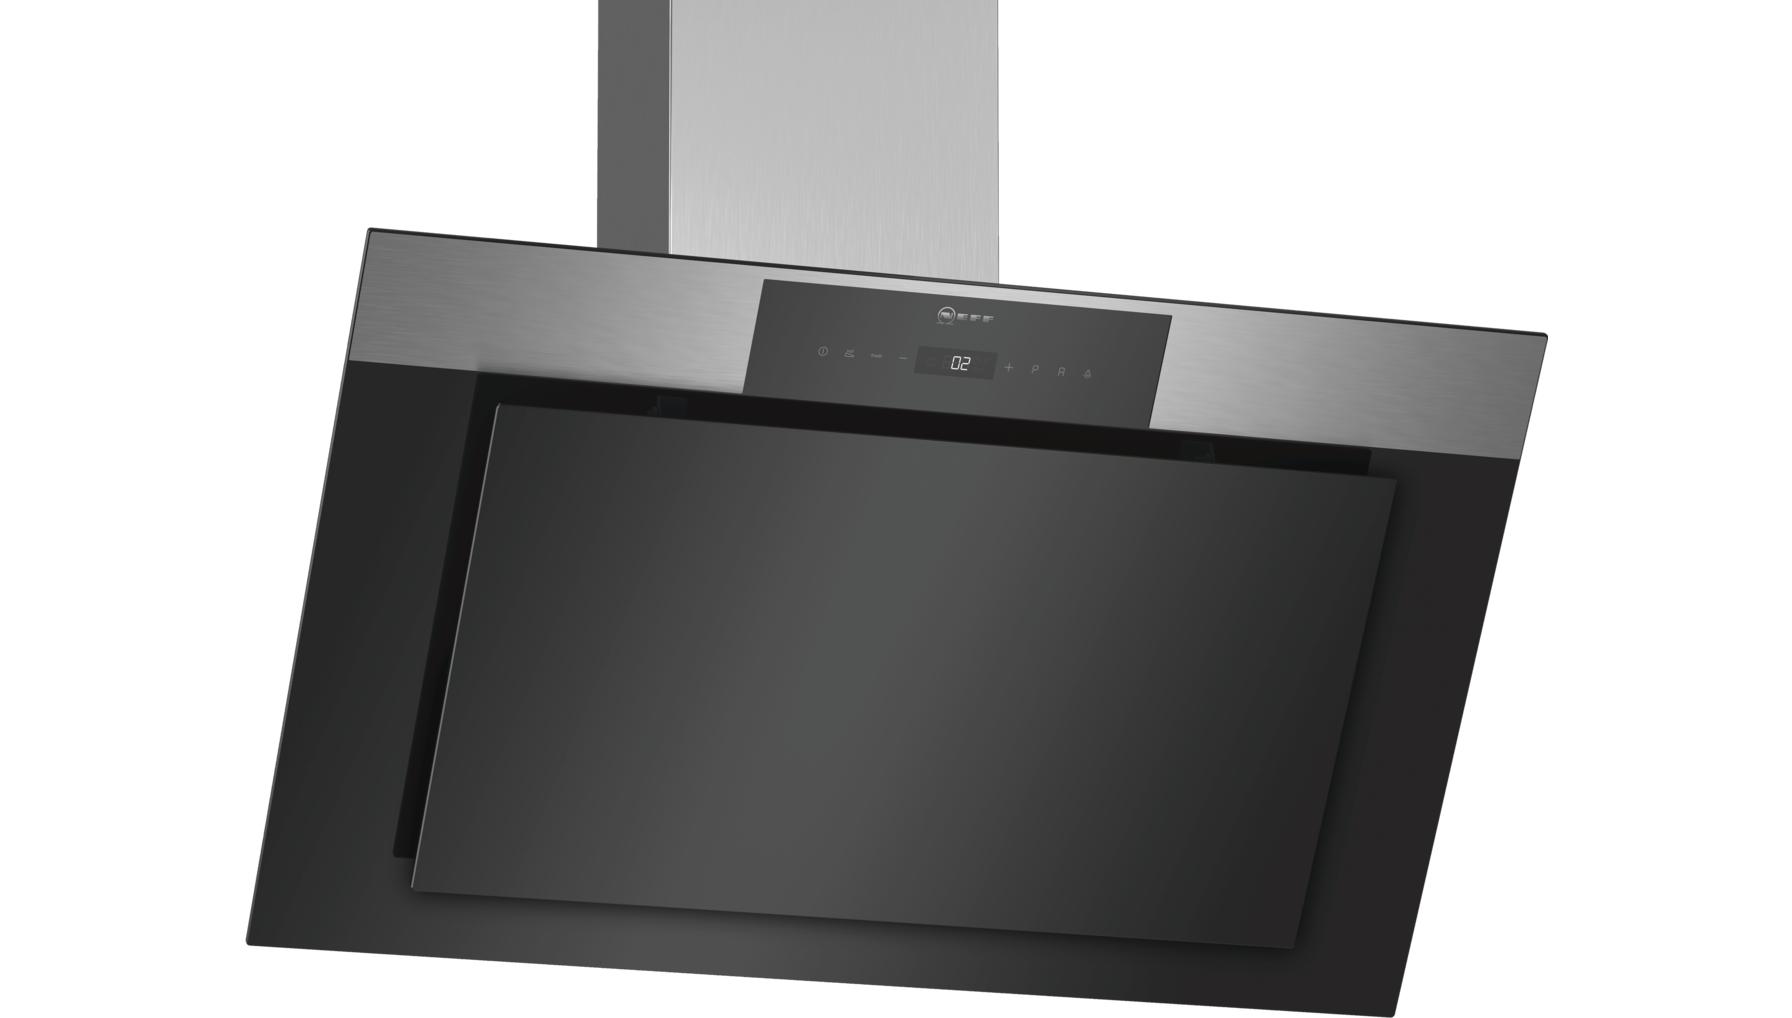 neff produkte dunstabzugshauben wandessen d96ipu1n0. Black Bedroom Furniture Sets. Home Design Ideas